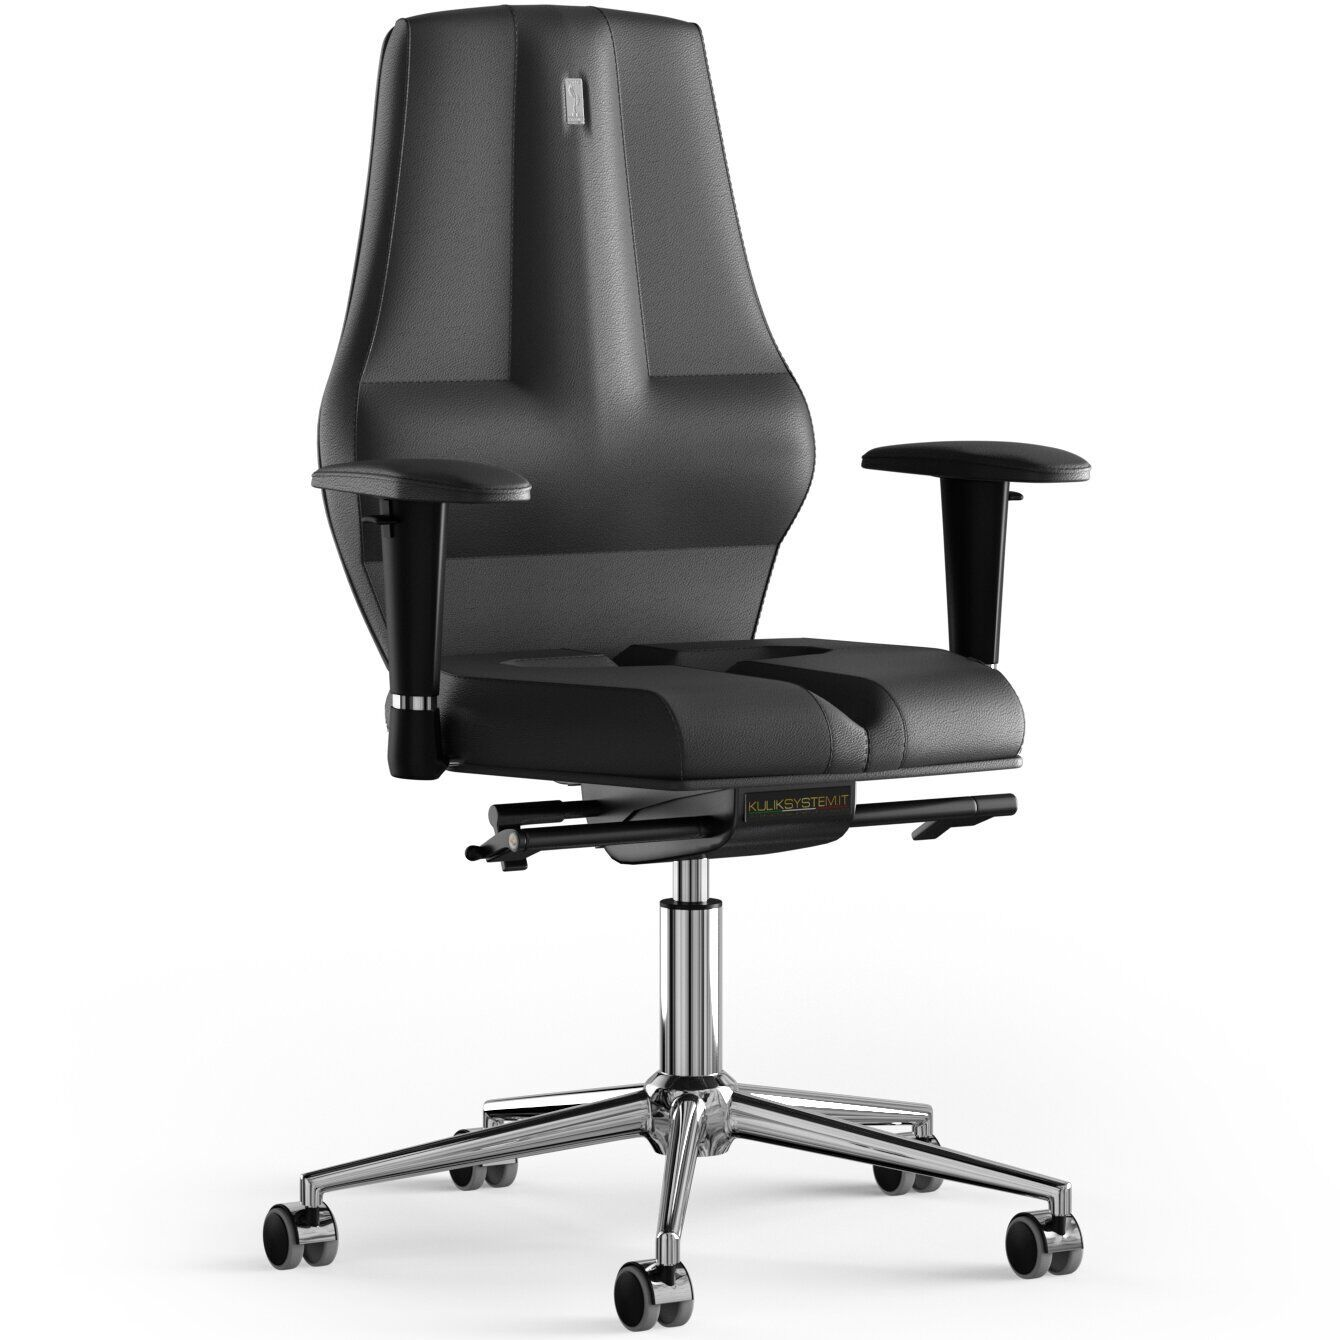 Кресло KULIK SYSTEM NANO Кожа без подголовника без строчки